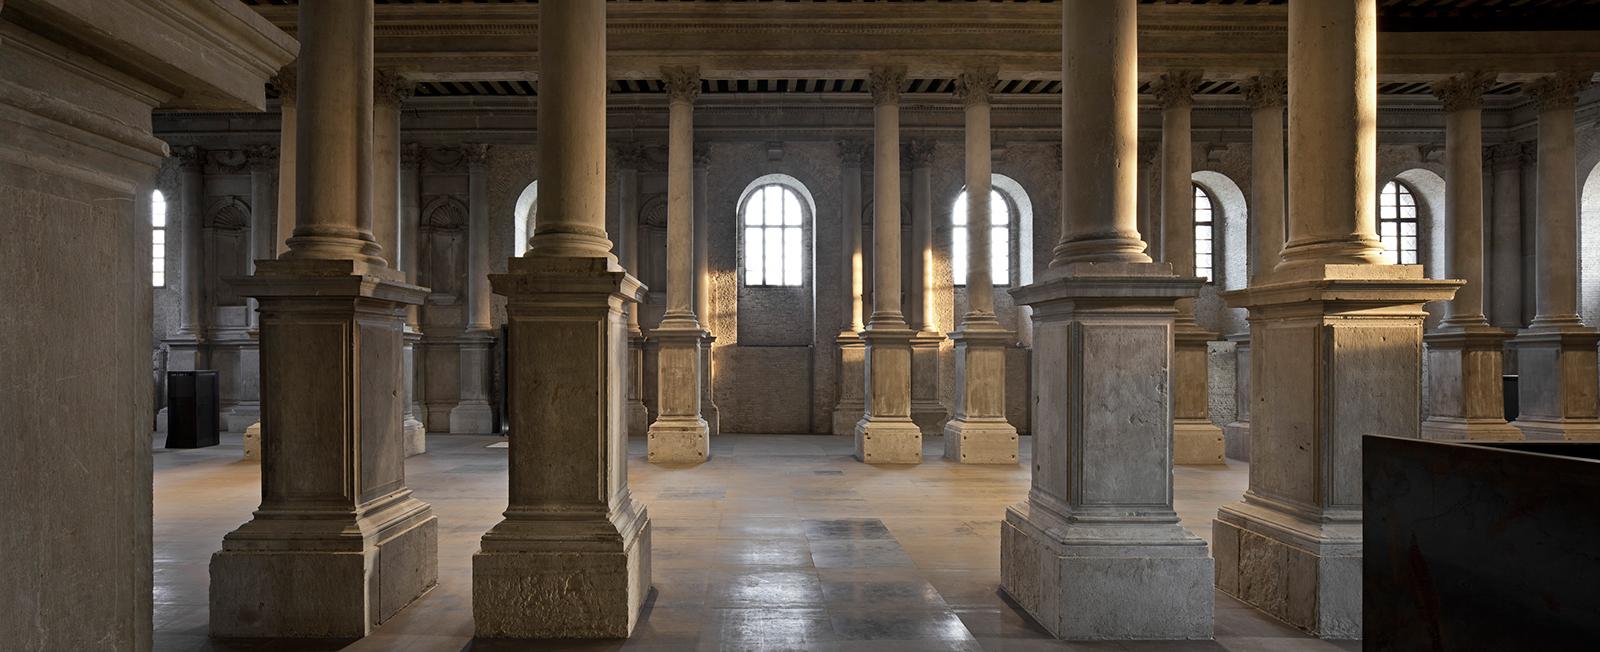 Venice s restored misericordia reclaims its place as one for Scuola sansovino venezia